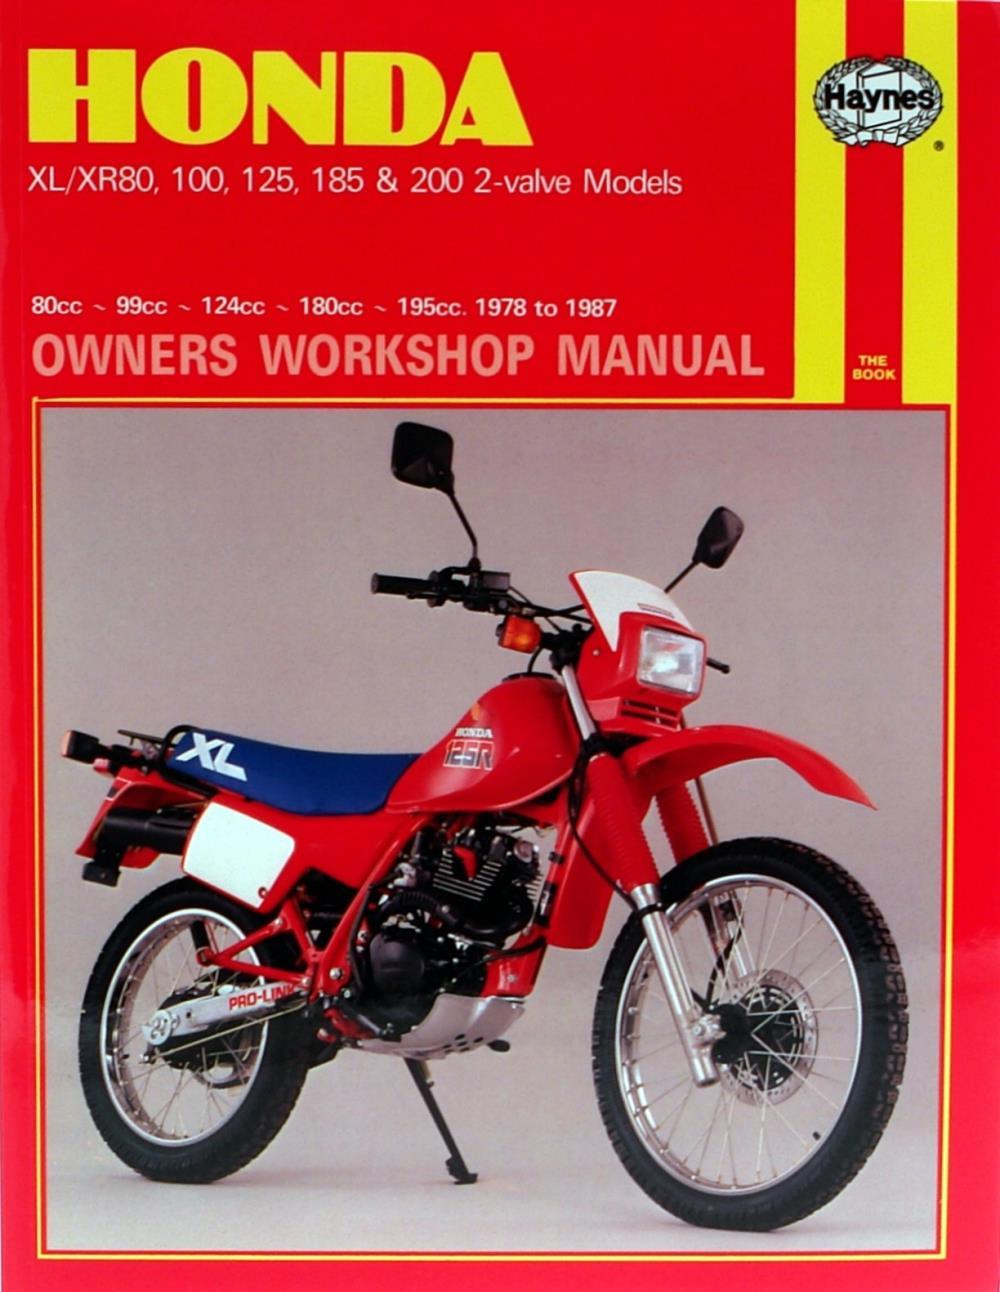 honda motorcycle wiring diagram xl100 plete car wheel parts ca95 best library 1980 xl 80 xr 1965 mr 250